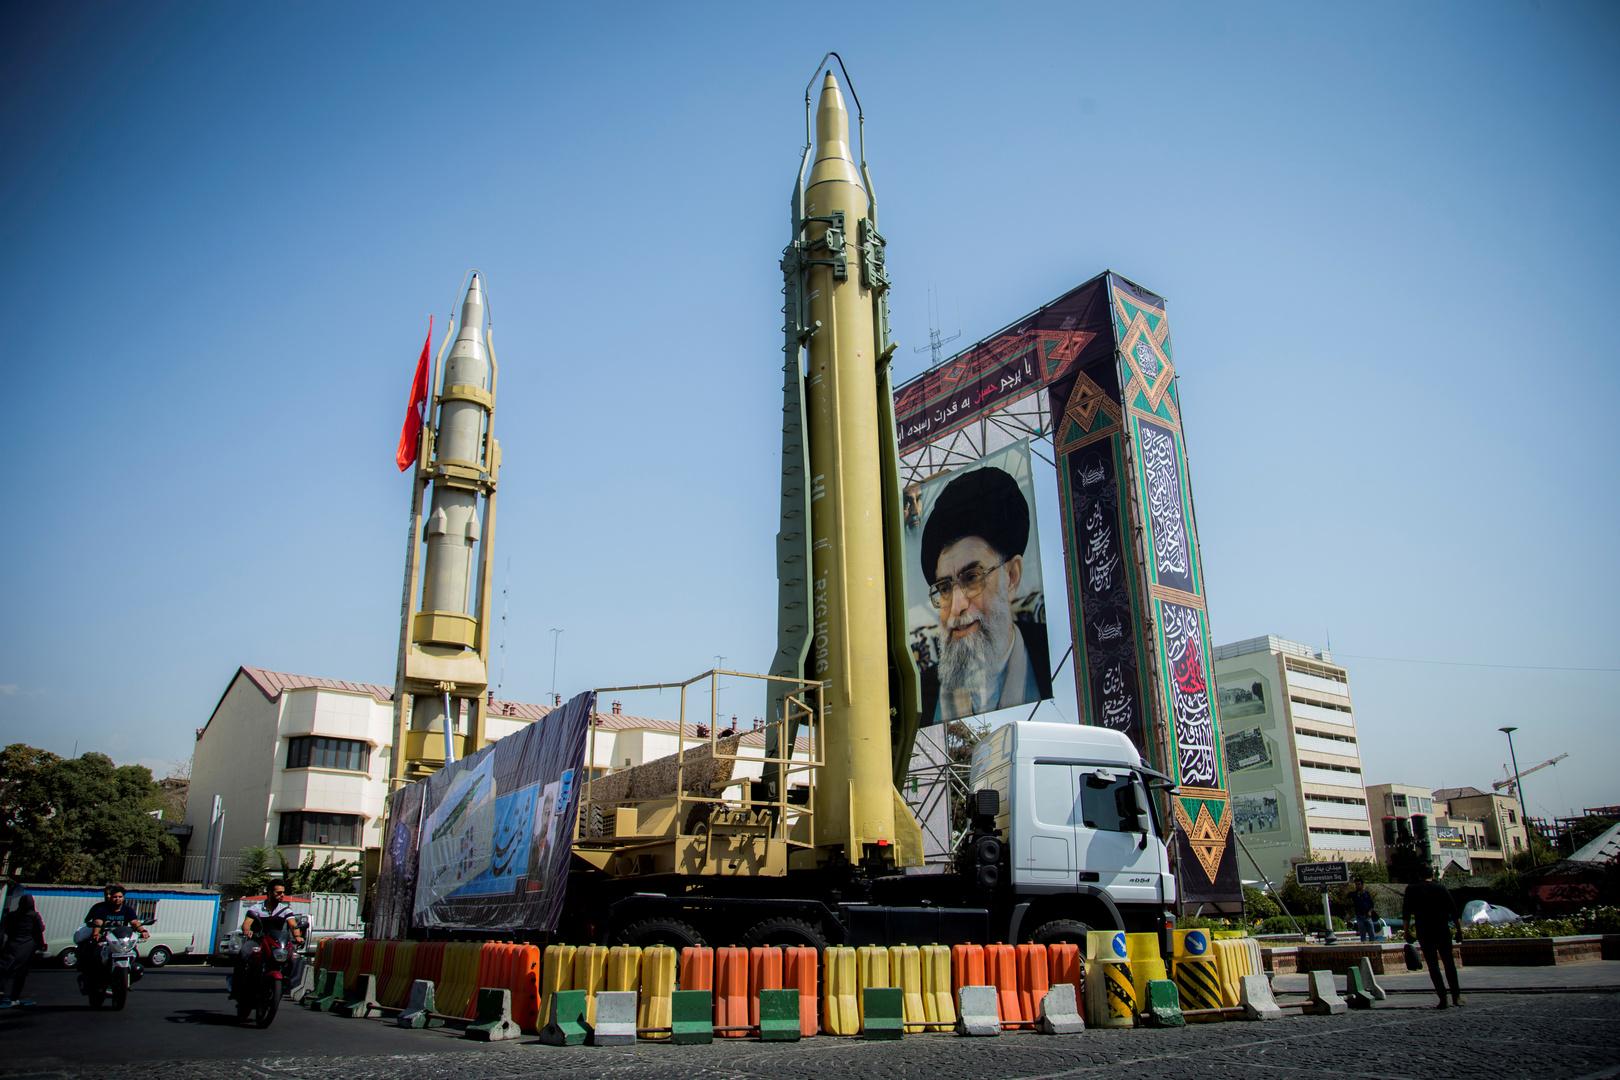 واشنطن بوست: إيران اختارت أهدافها بدقة لتفادي وقوع خسائر